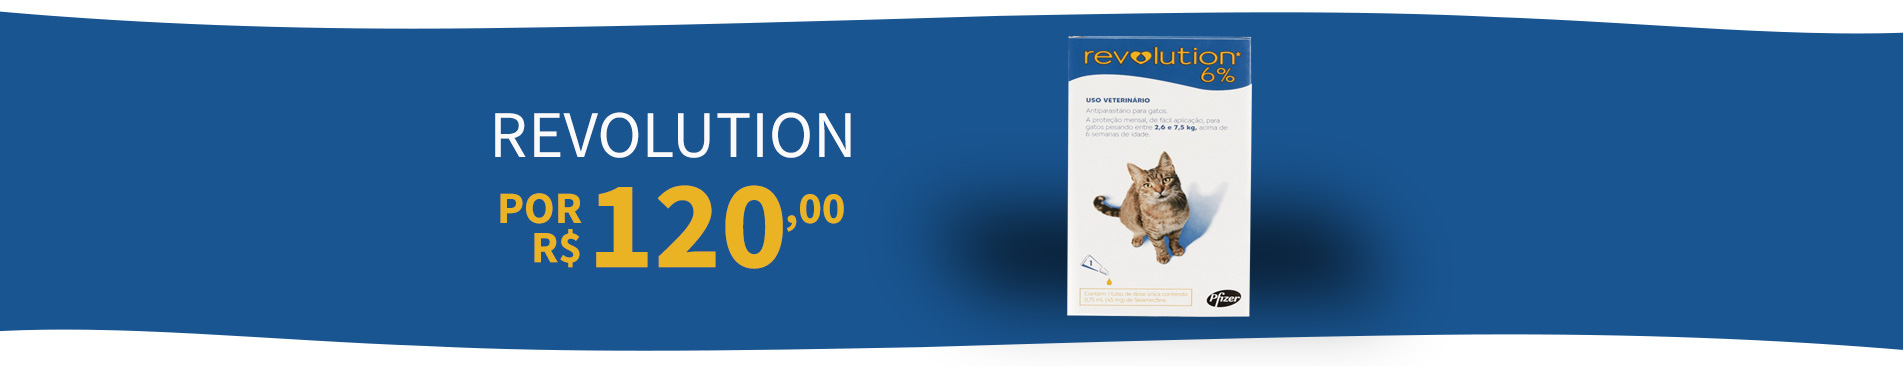 Revolution 6% 3 unidades por R$ 120,00